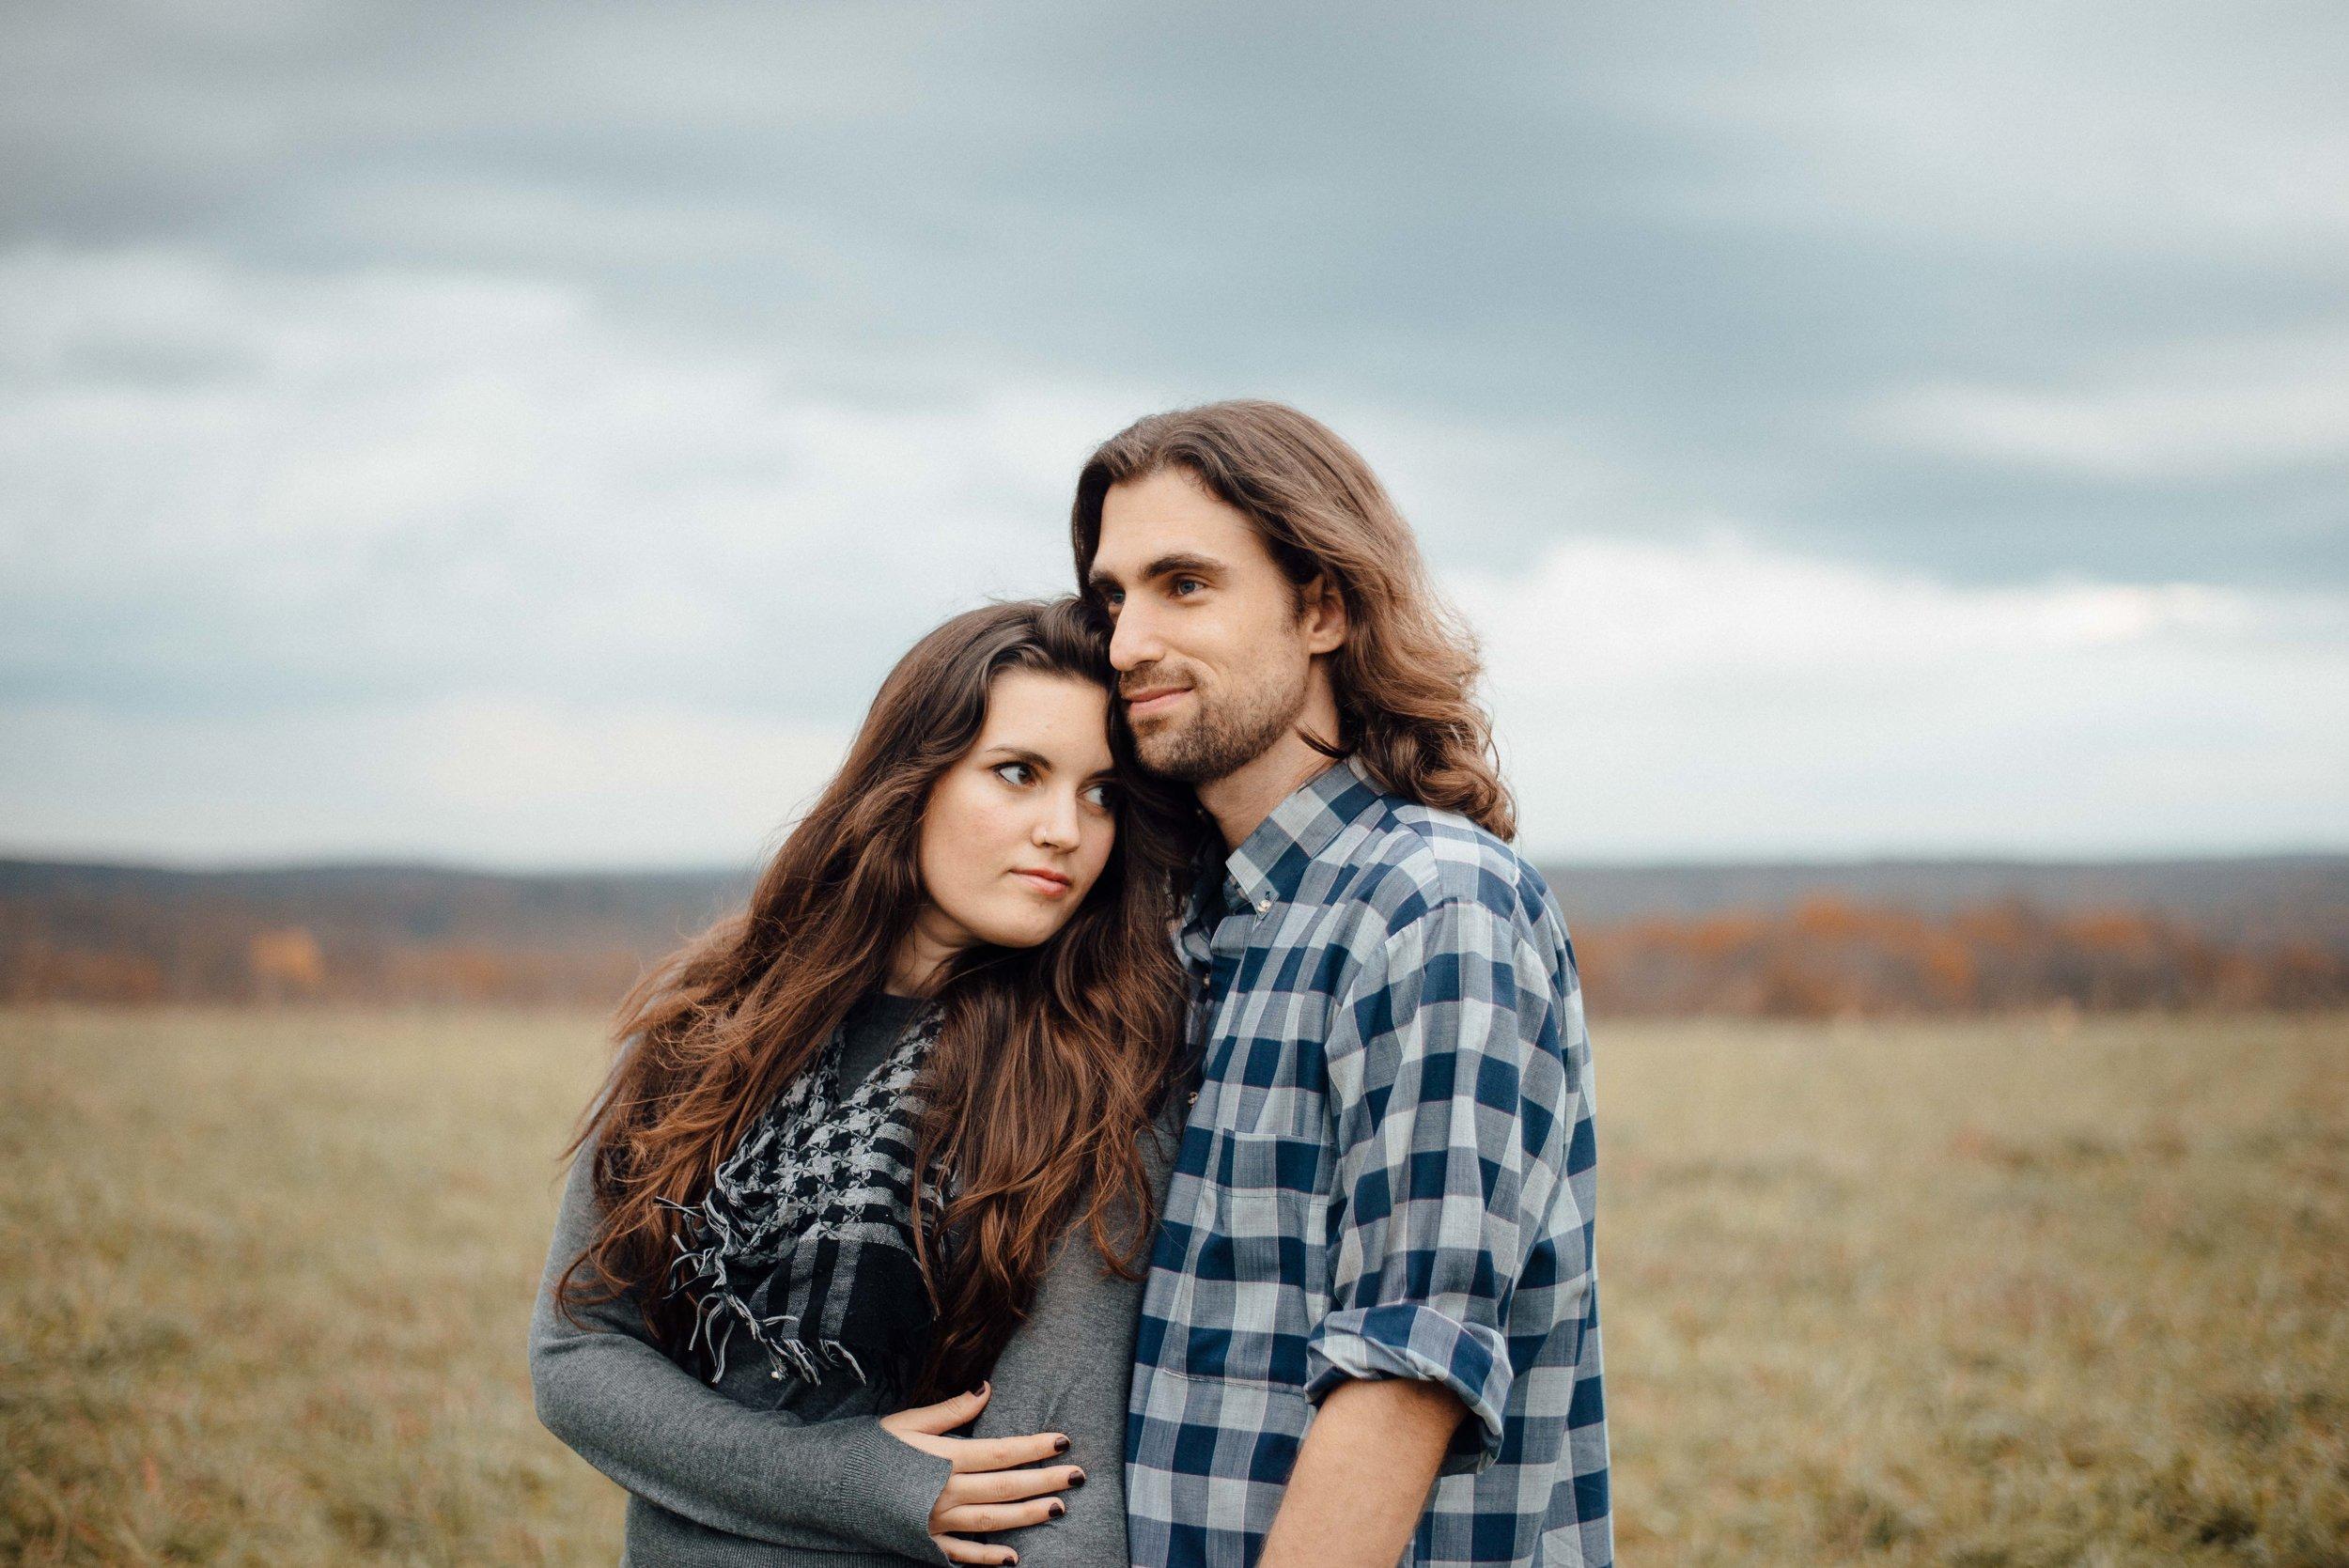 nop171103_ryan and sarah-26.jpg